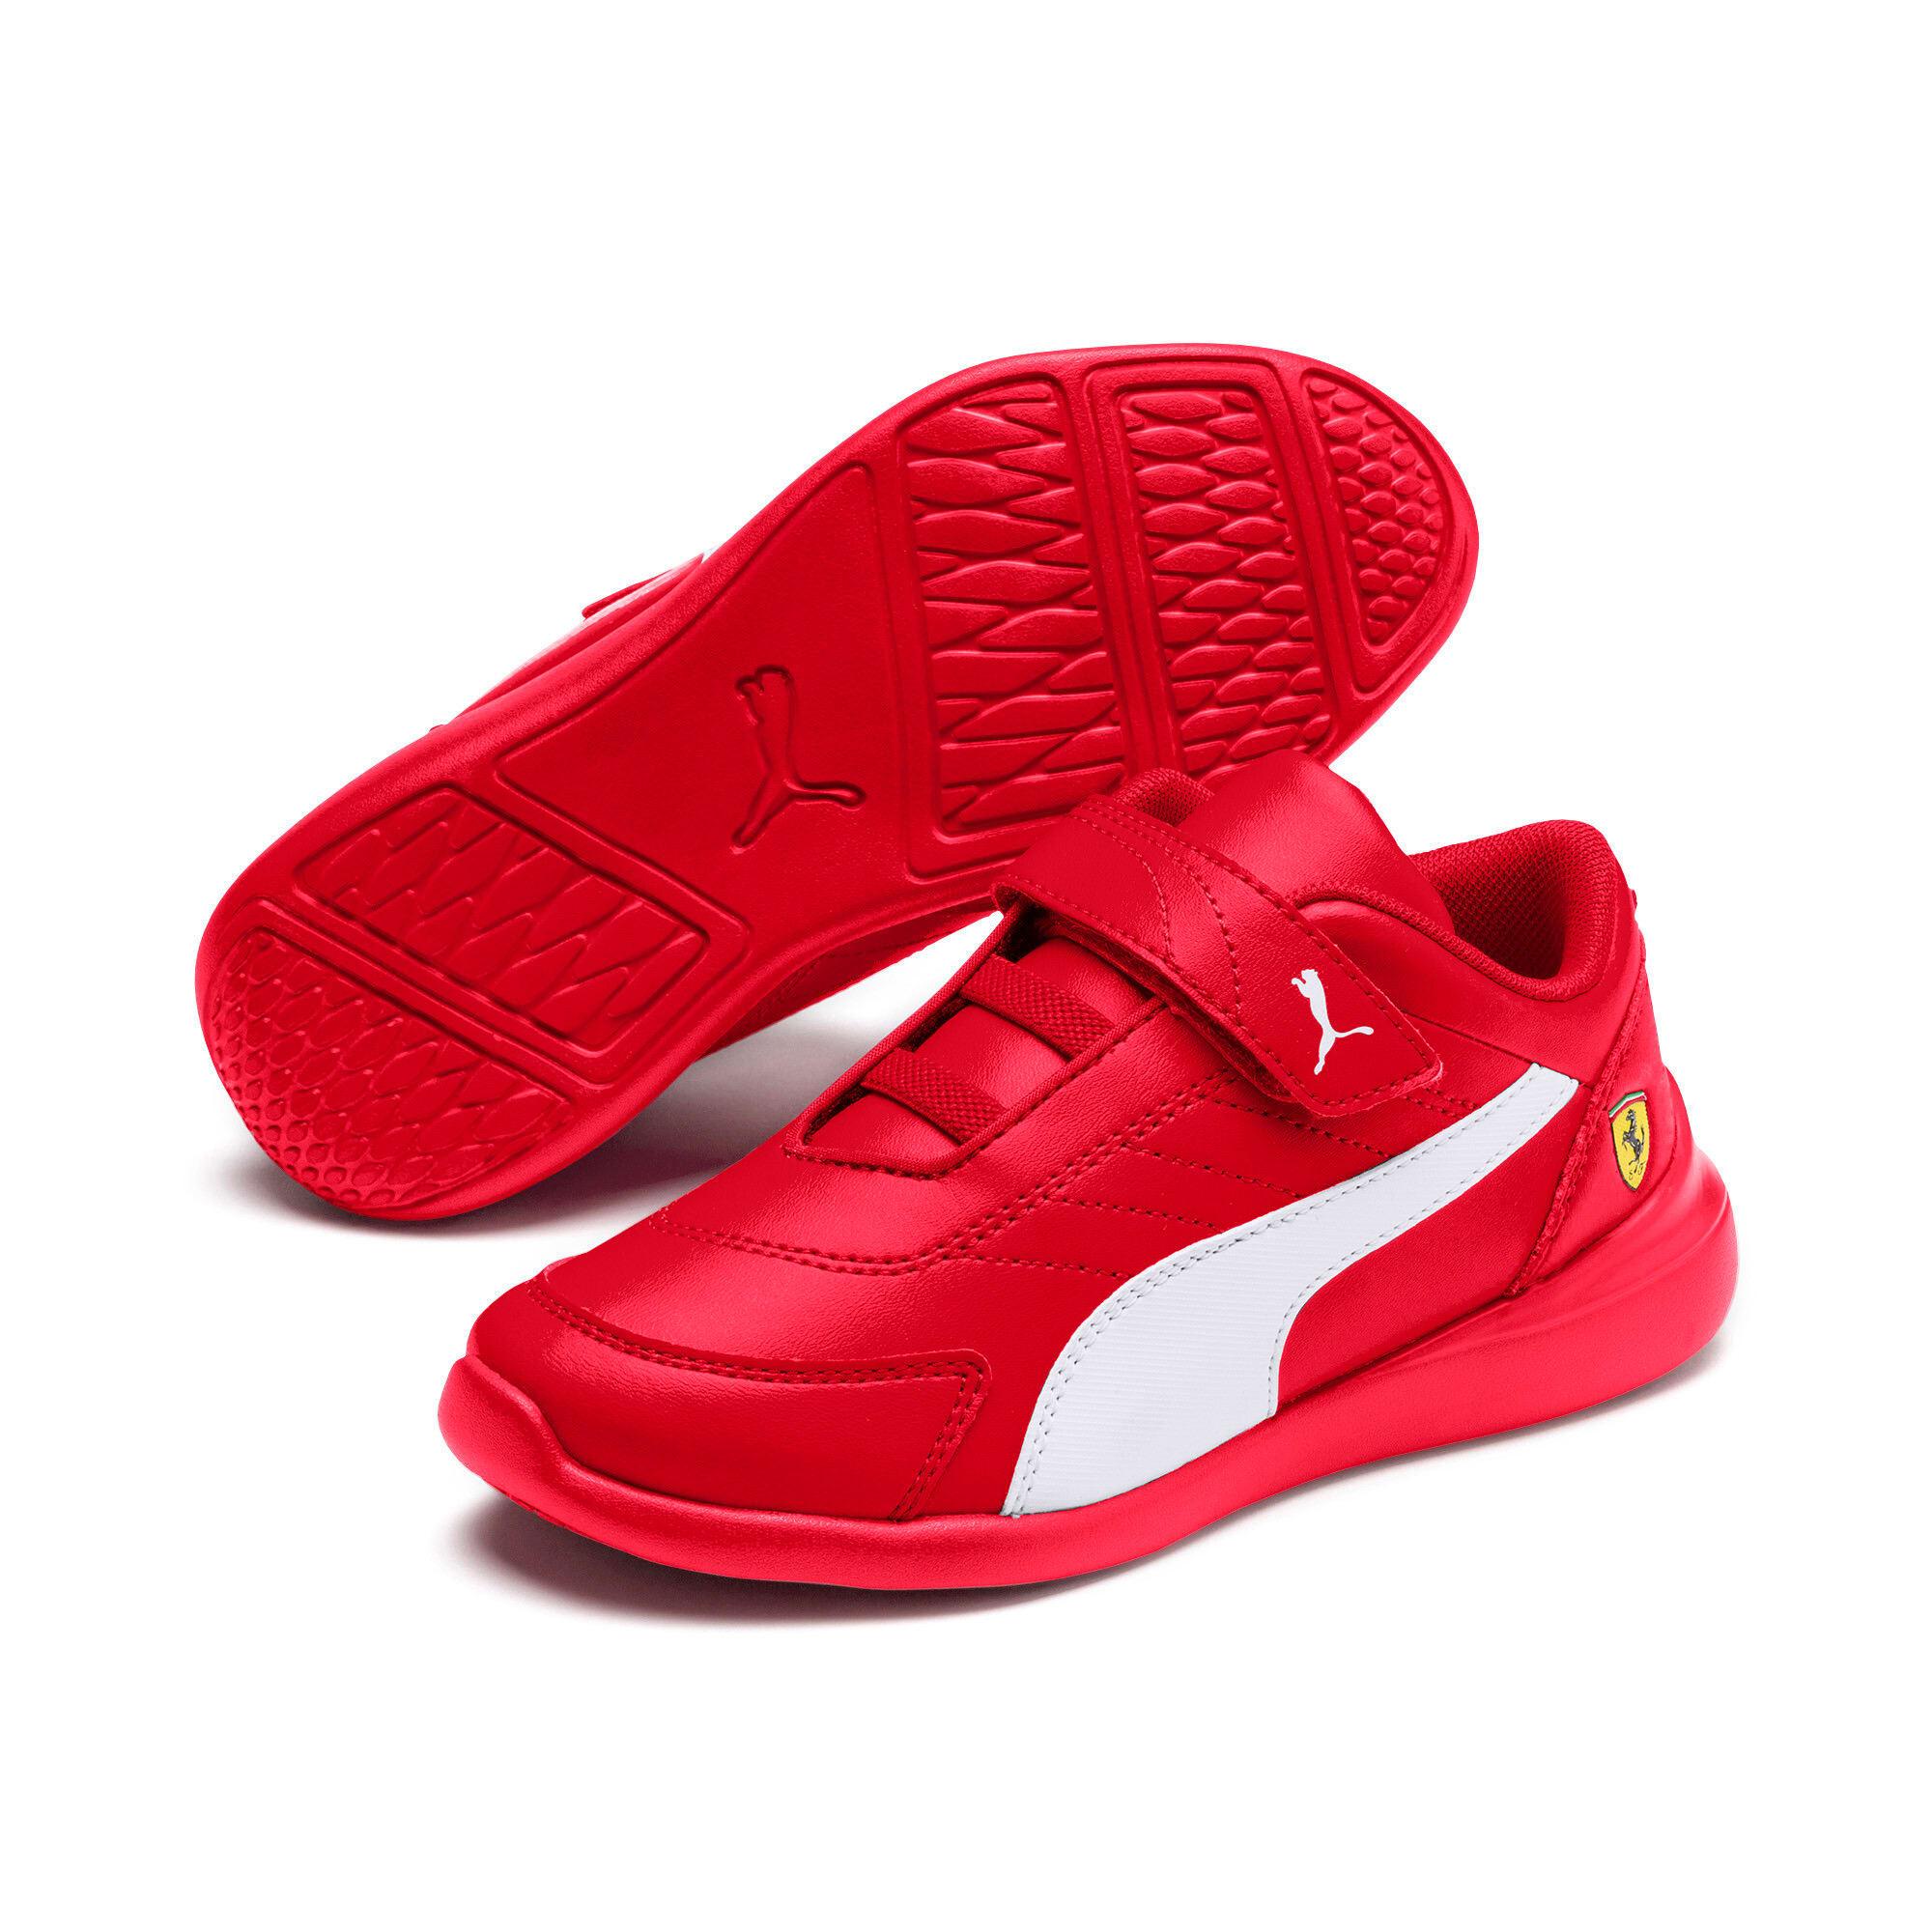 Thumbnail 2 of Ferrari Kart Cat III Kids Sneaker, Rosso Corsa-Wht-Rosso Corsa, medium